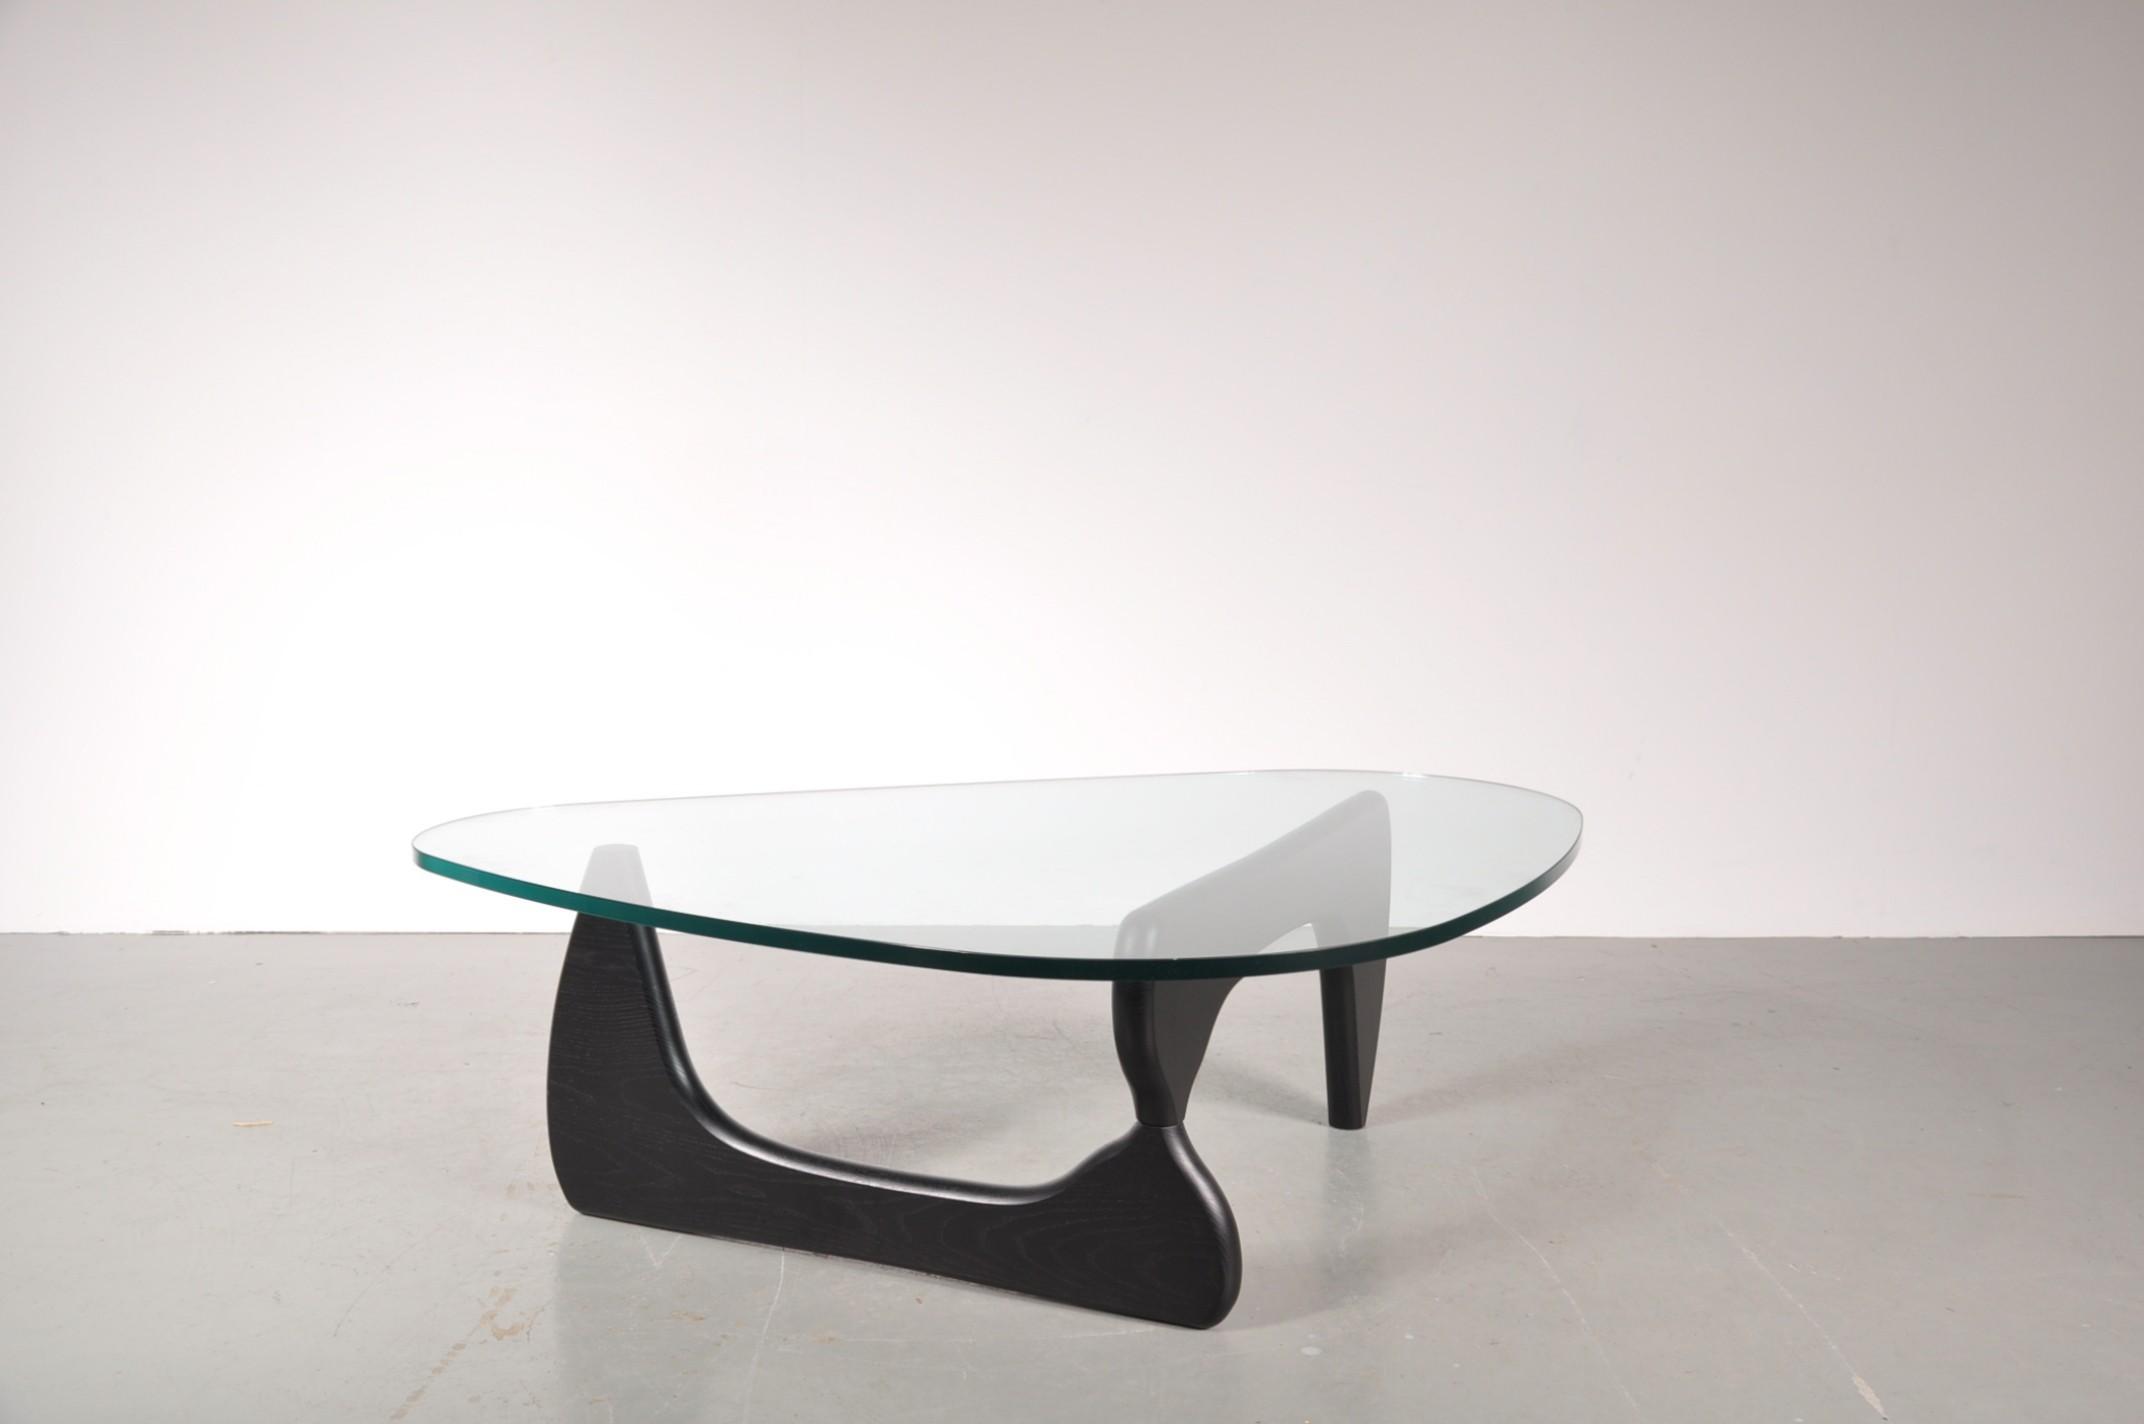 Herman Miller glass coffee table Isamu NOGUCHI 1980s Design